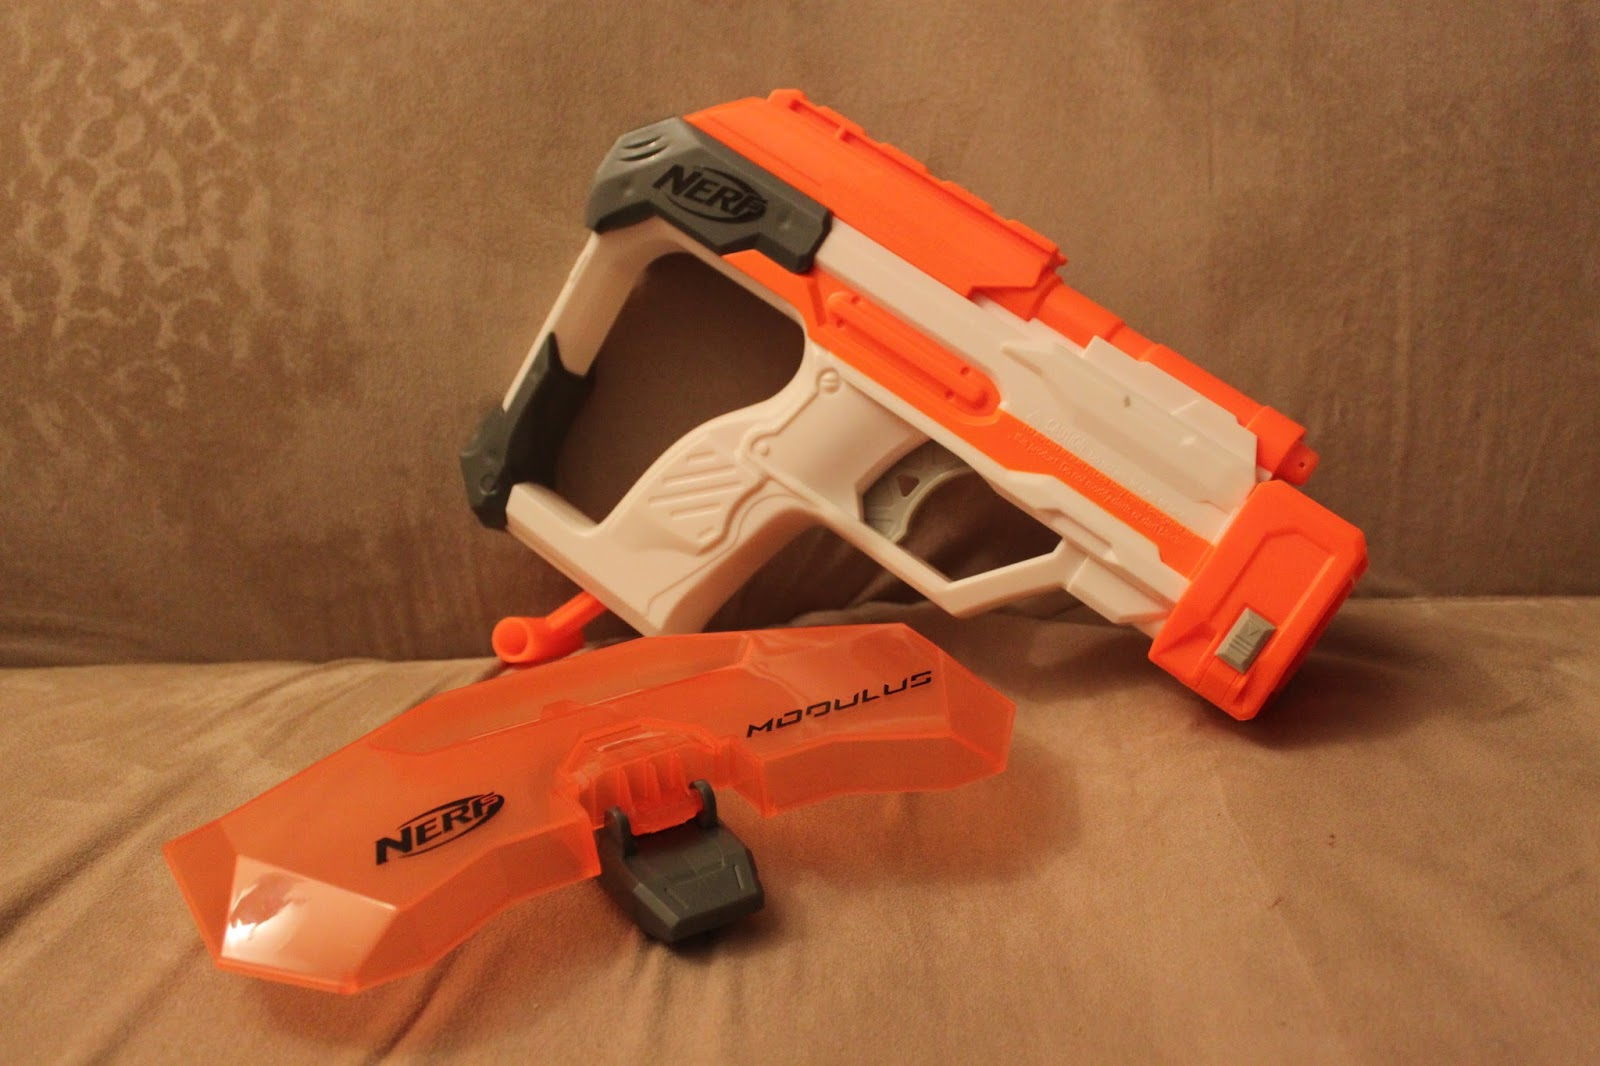 nerf gun modulus instructions